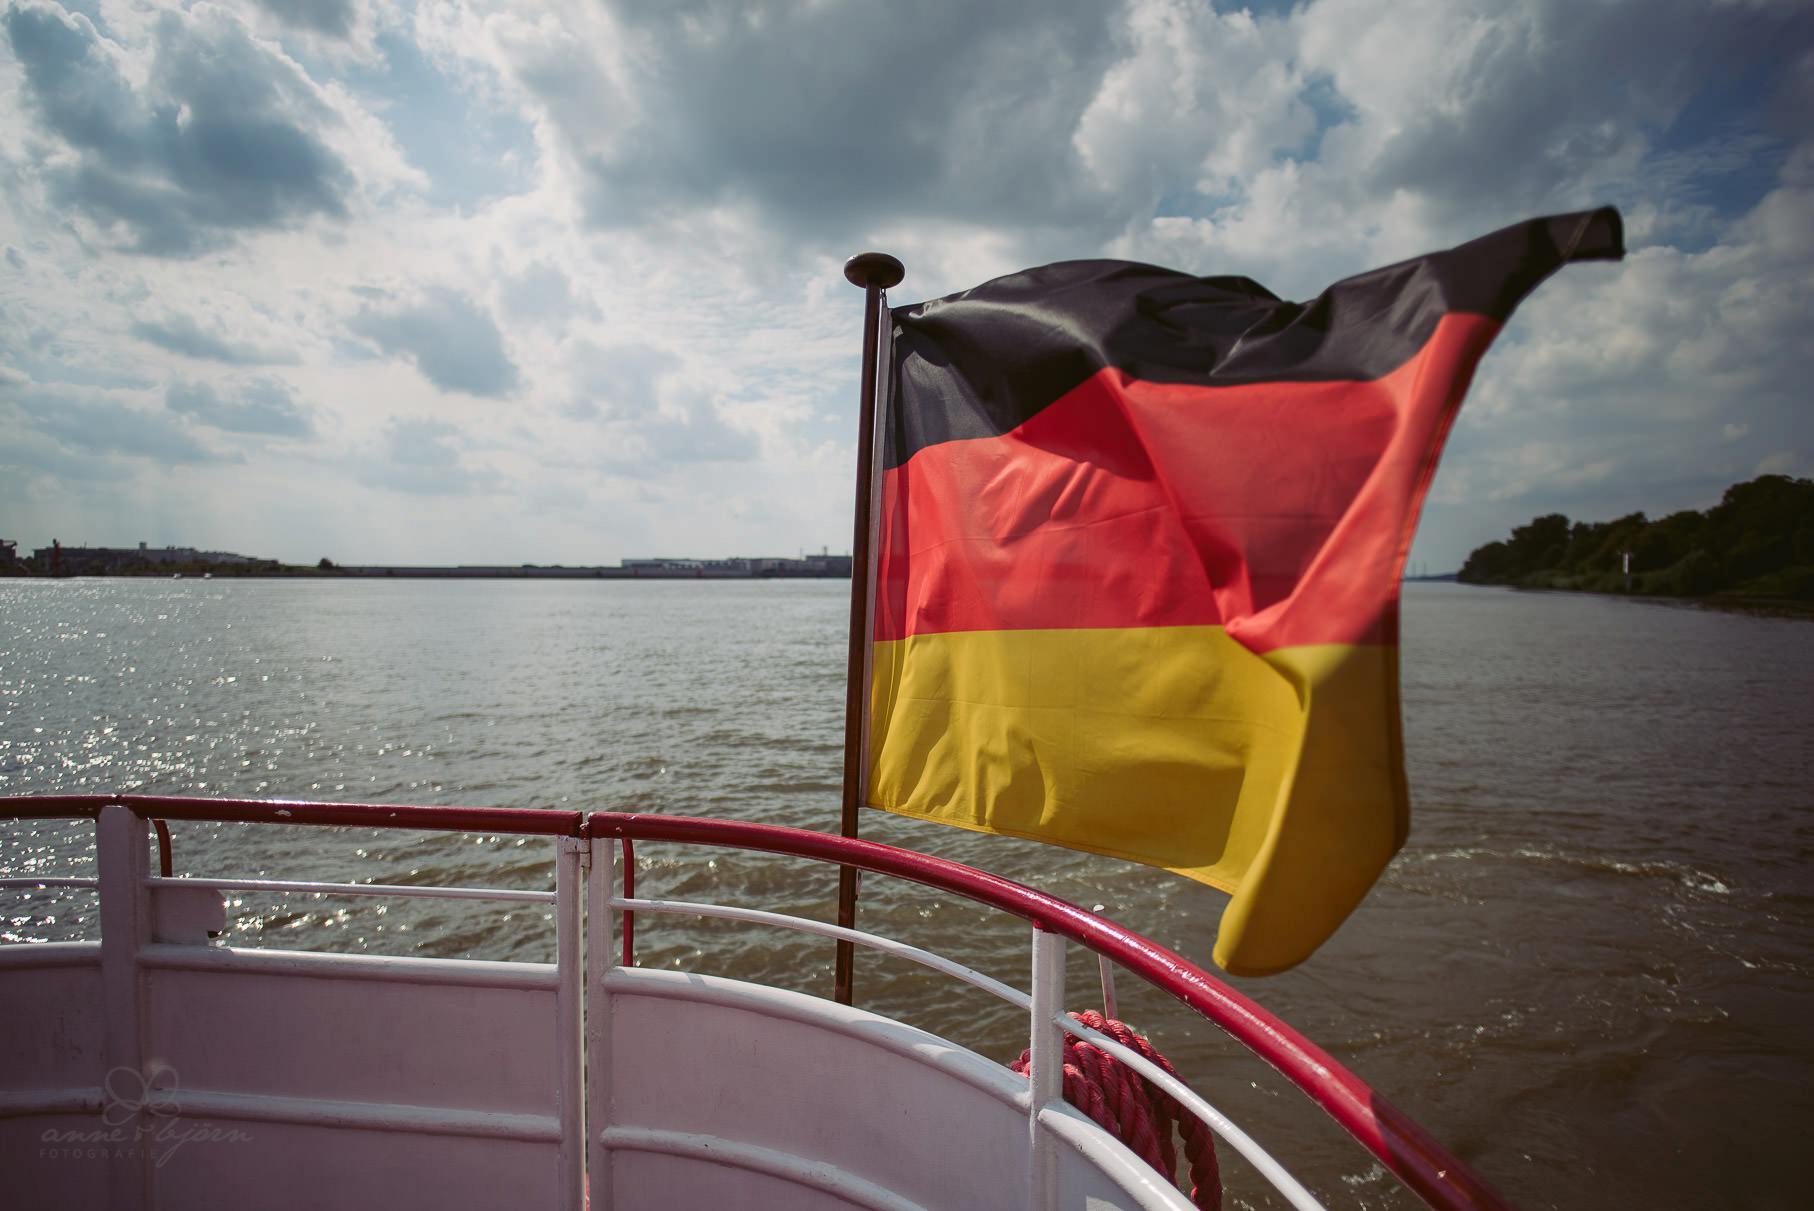 0054 aud blog 811 0458 - Hochzeit an der Hamburger Elbe - Ann-Katrin & Daniel